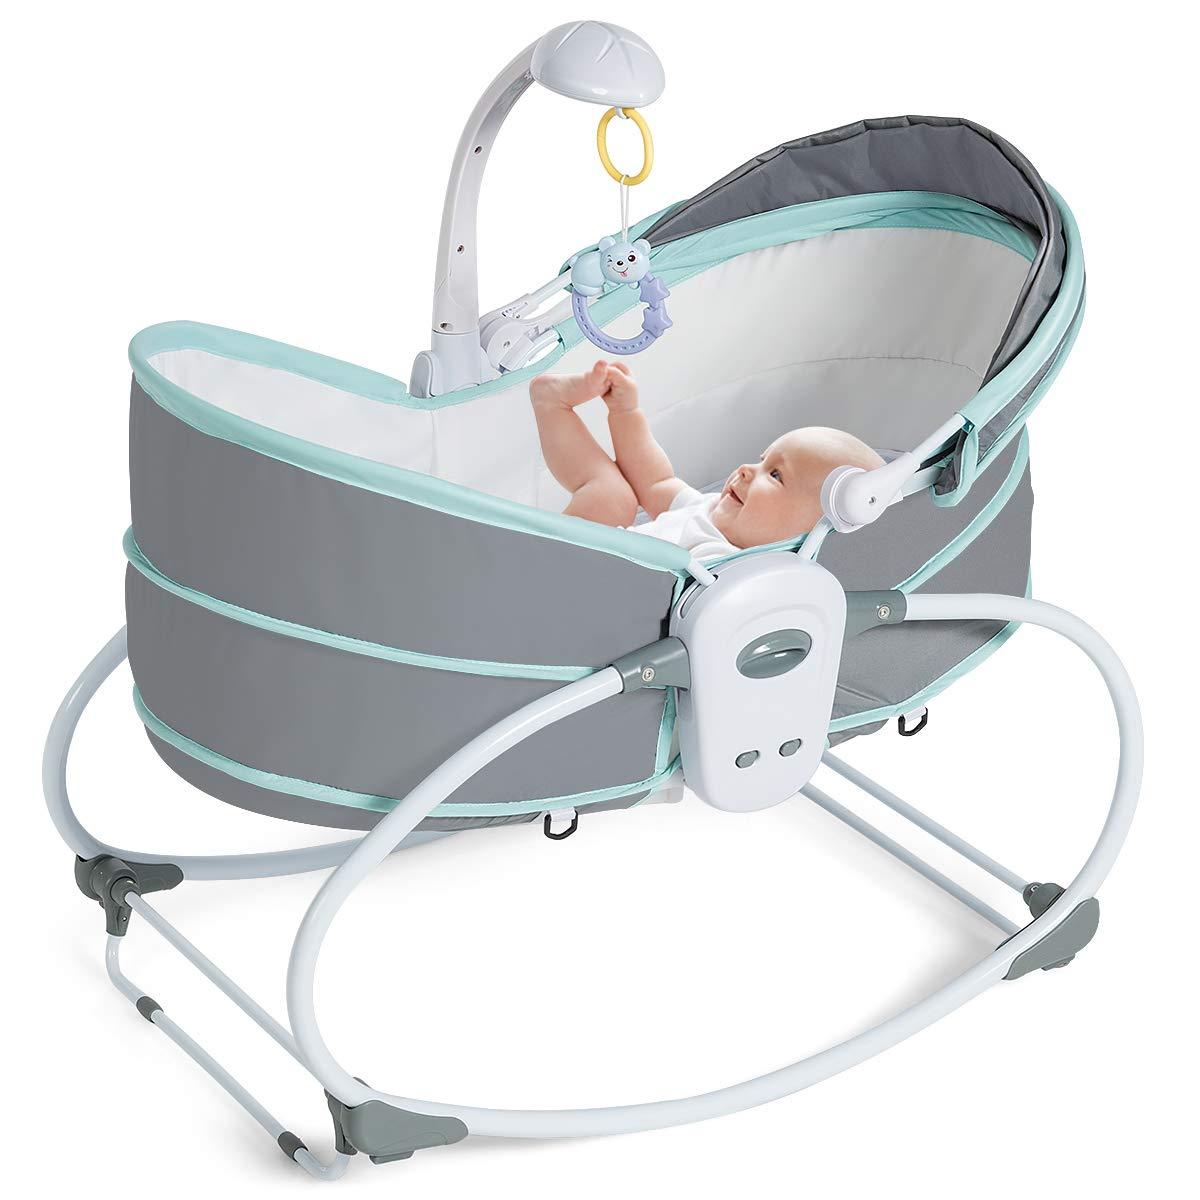 Turn Drop Side Baby Crib Into a Fixed Side Crib-Novice